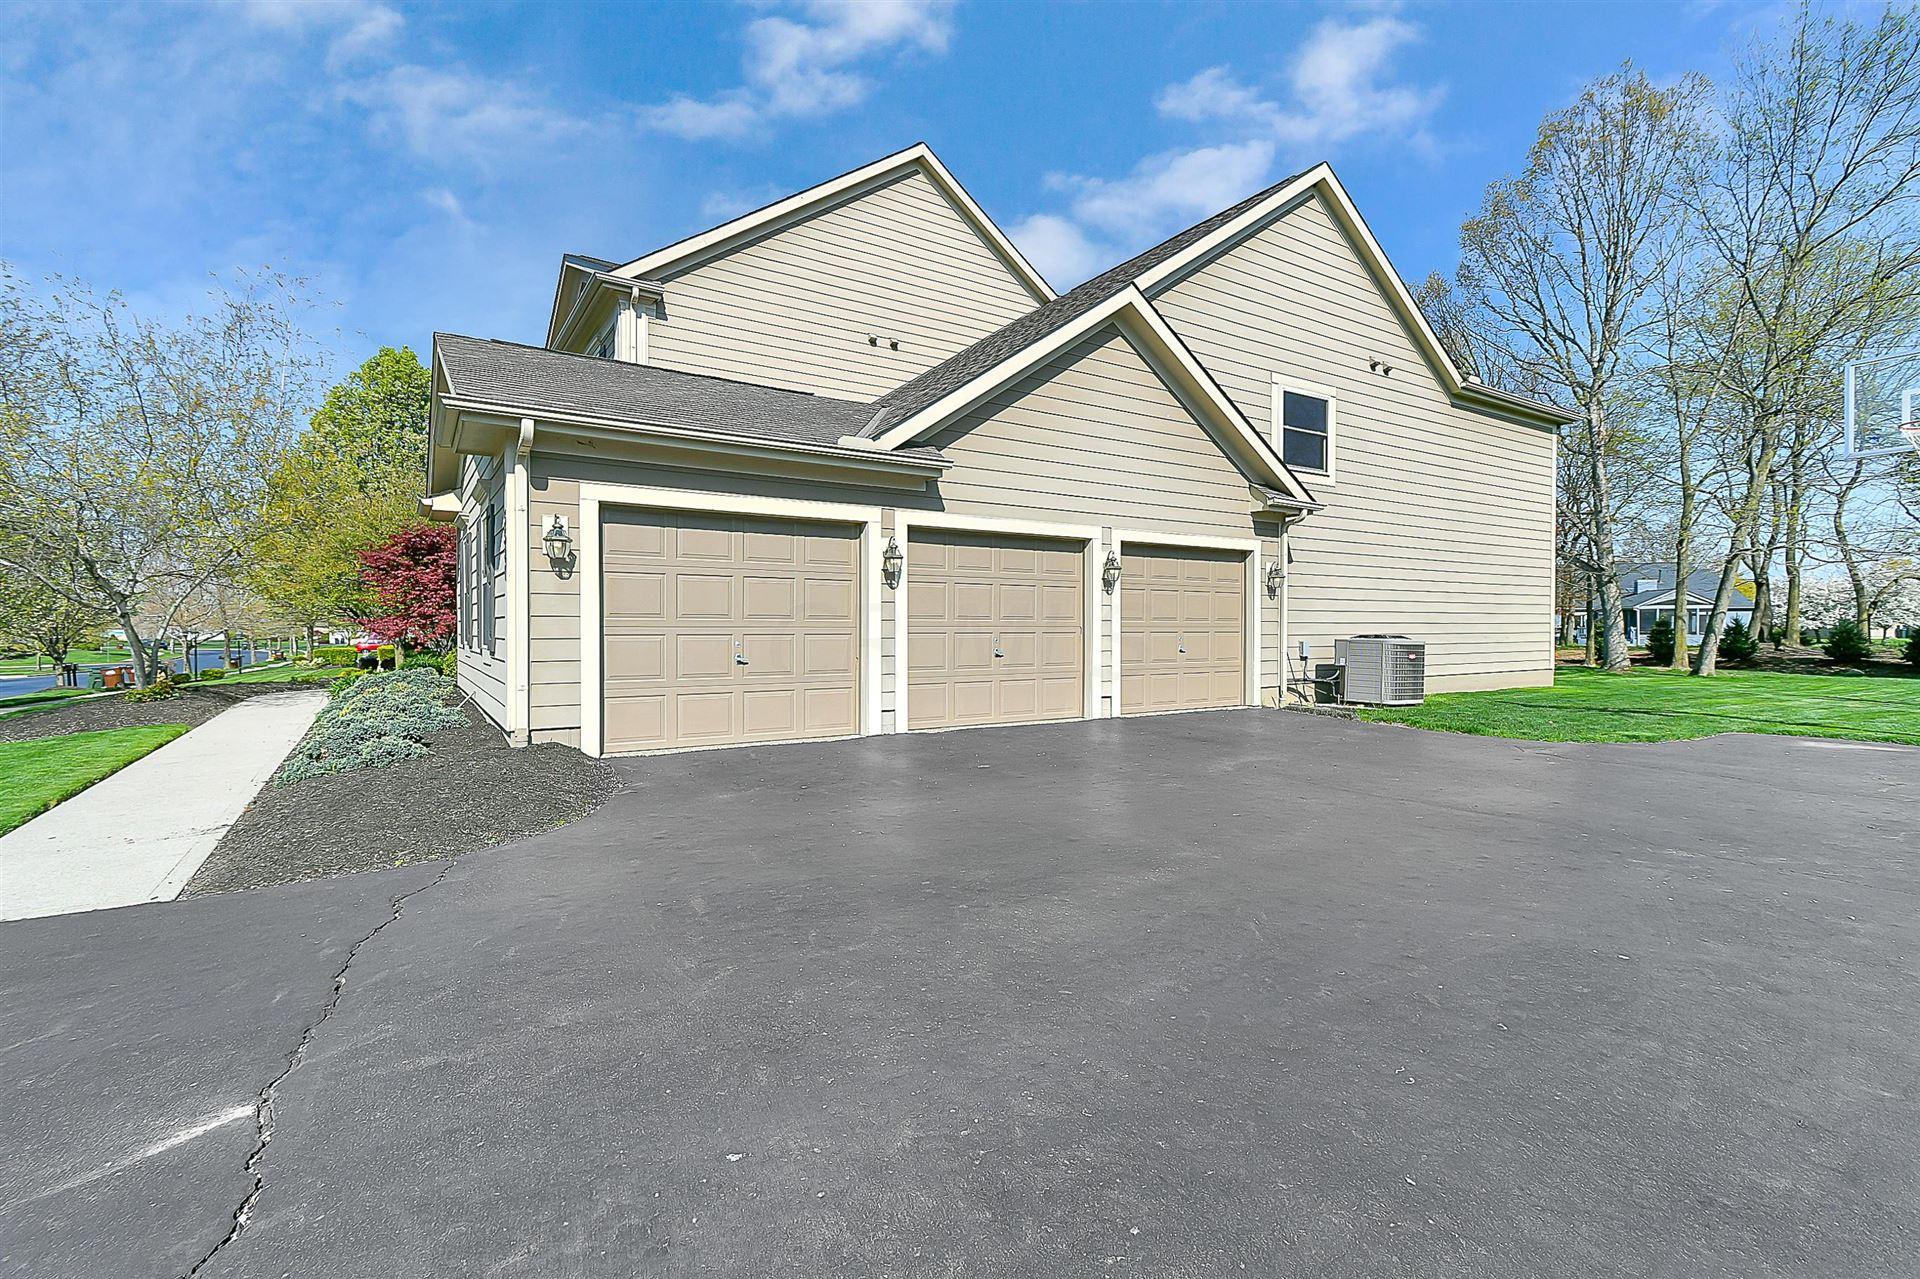 Photo of 5587 Bayside Ridge Drive, Galena, OH 43021 (MLS # 221012316)